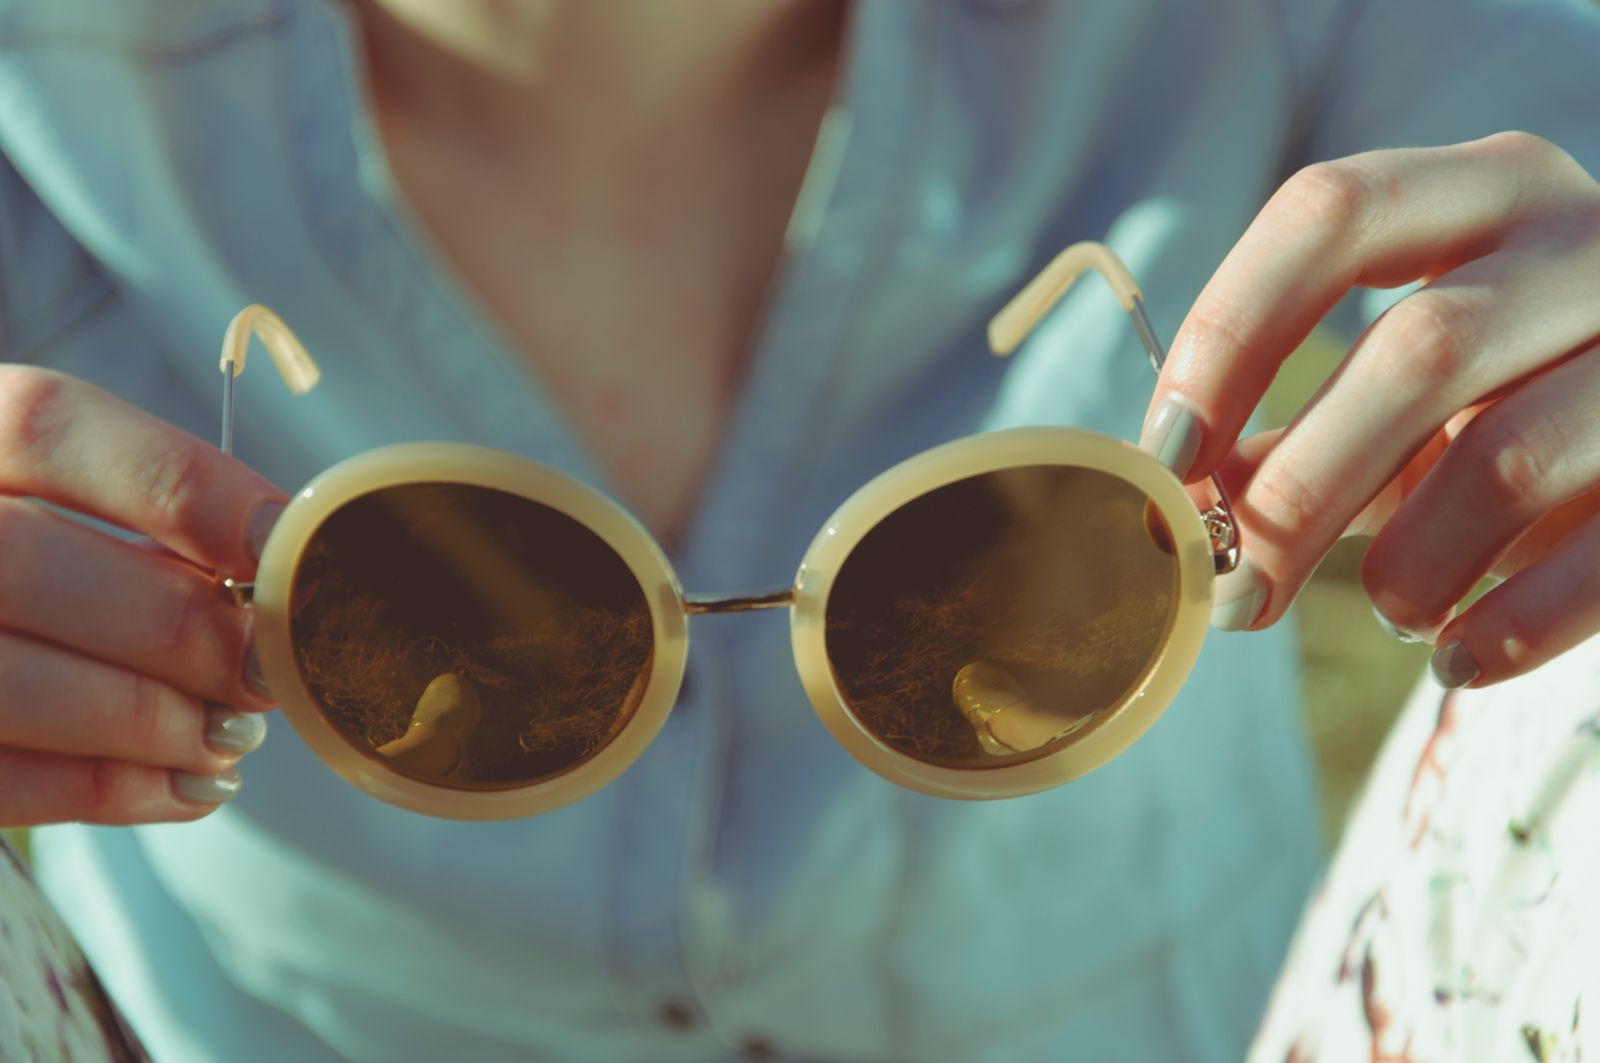 Woman holding sunglasses image